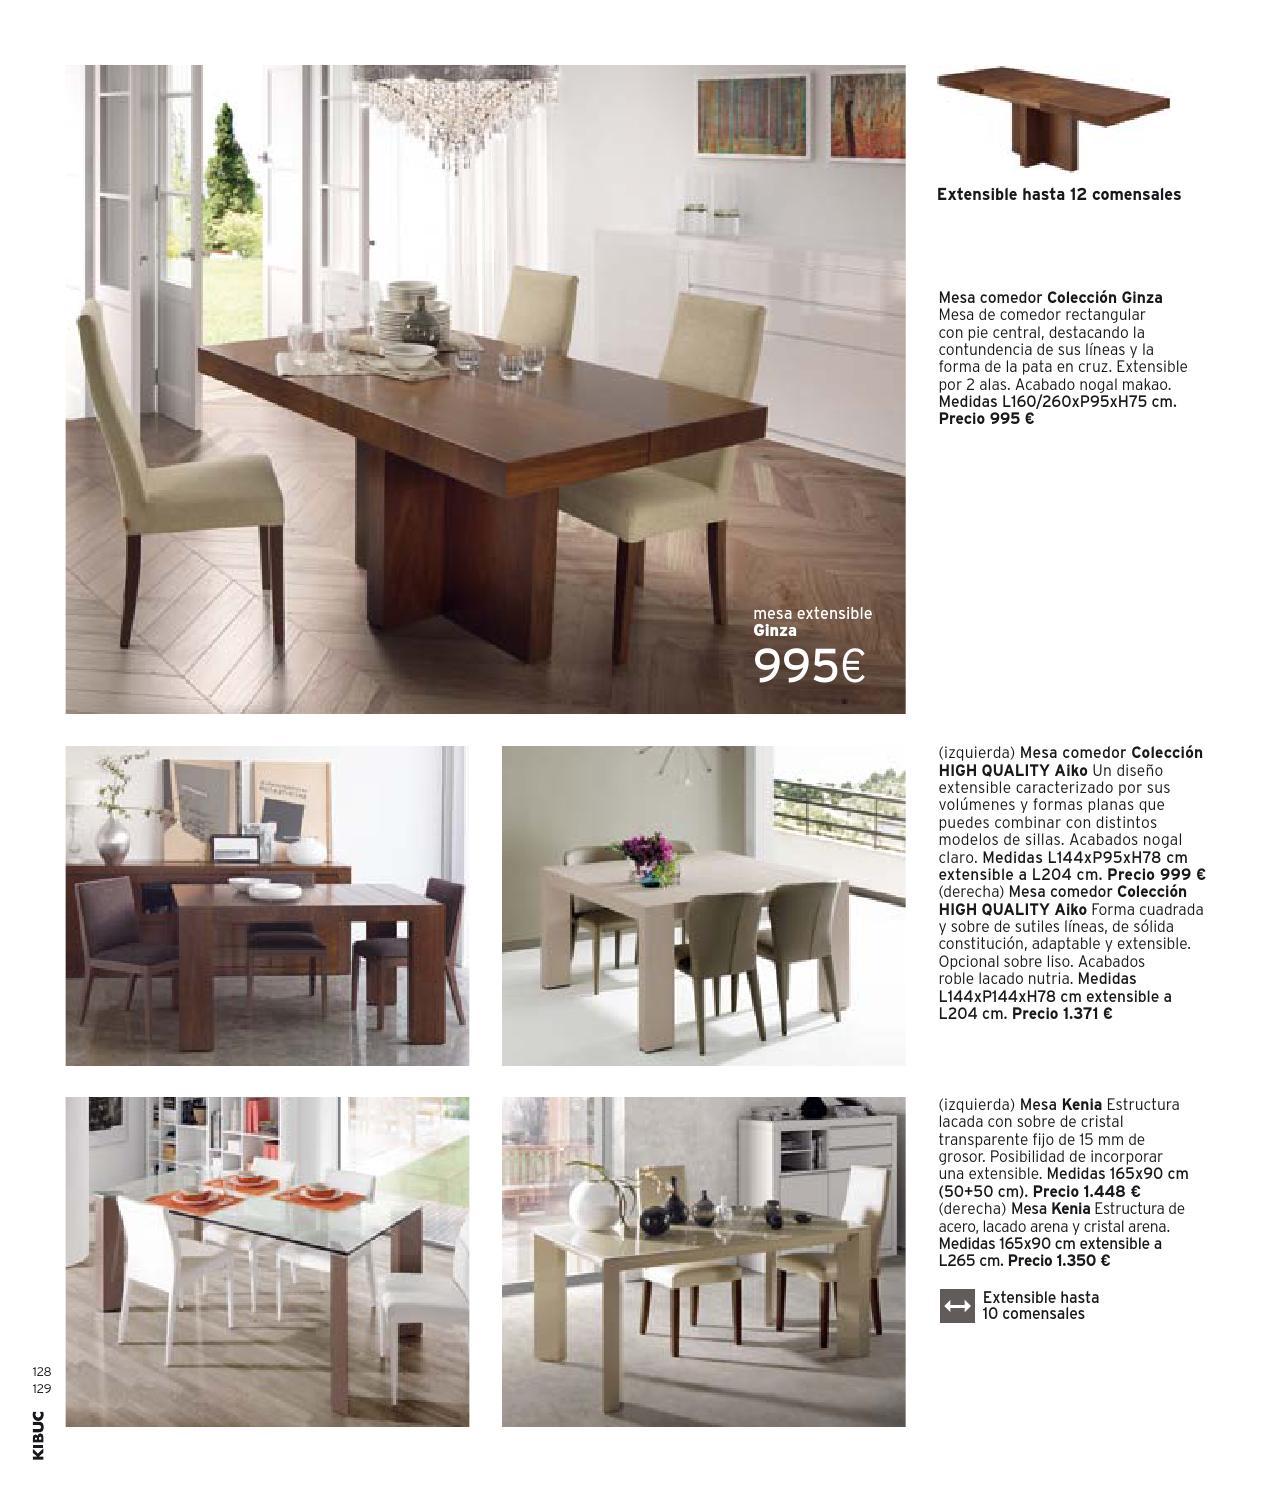 Catalogo 2014 15 by Kibuc - issuu